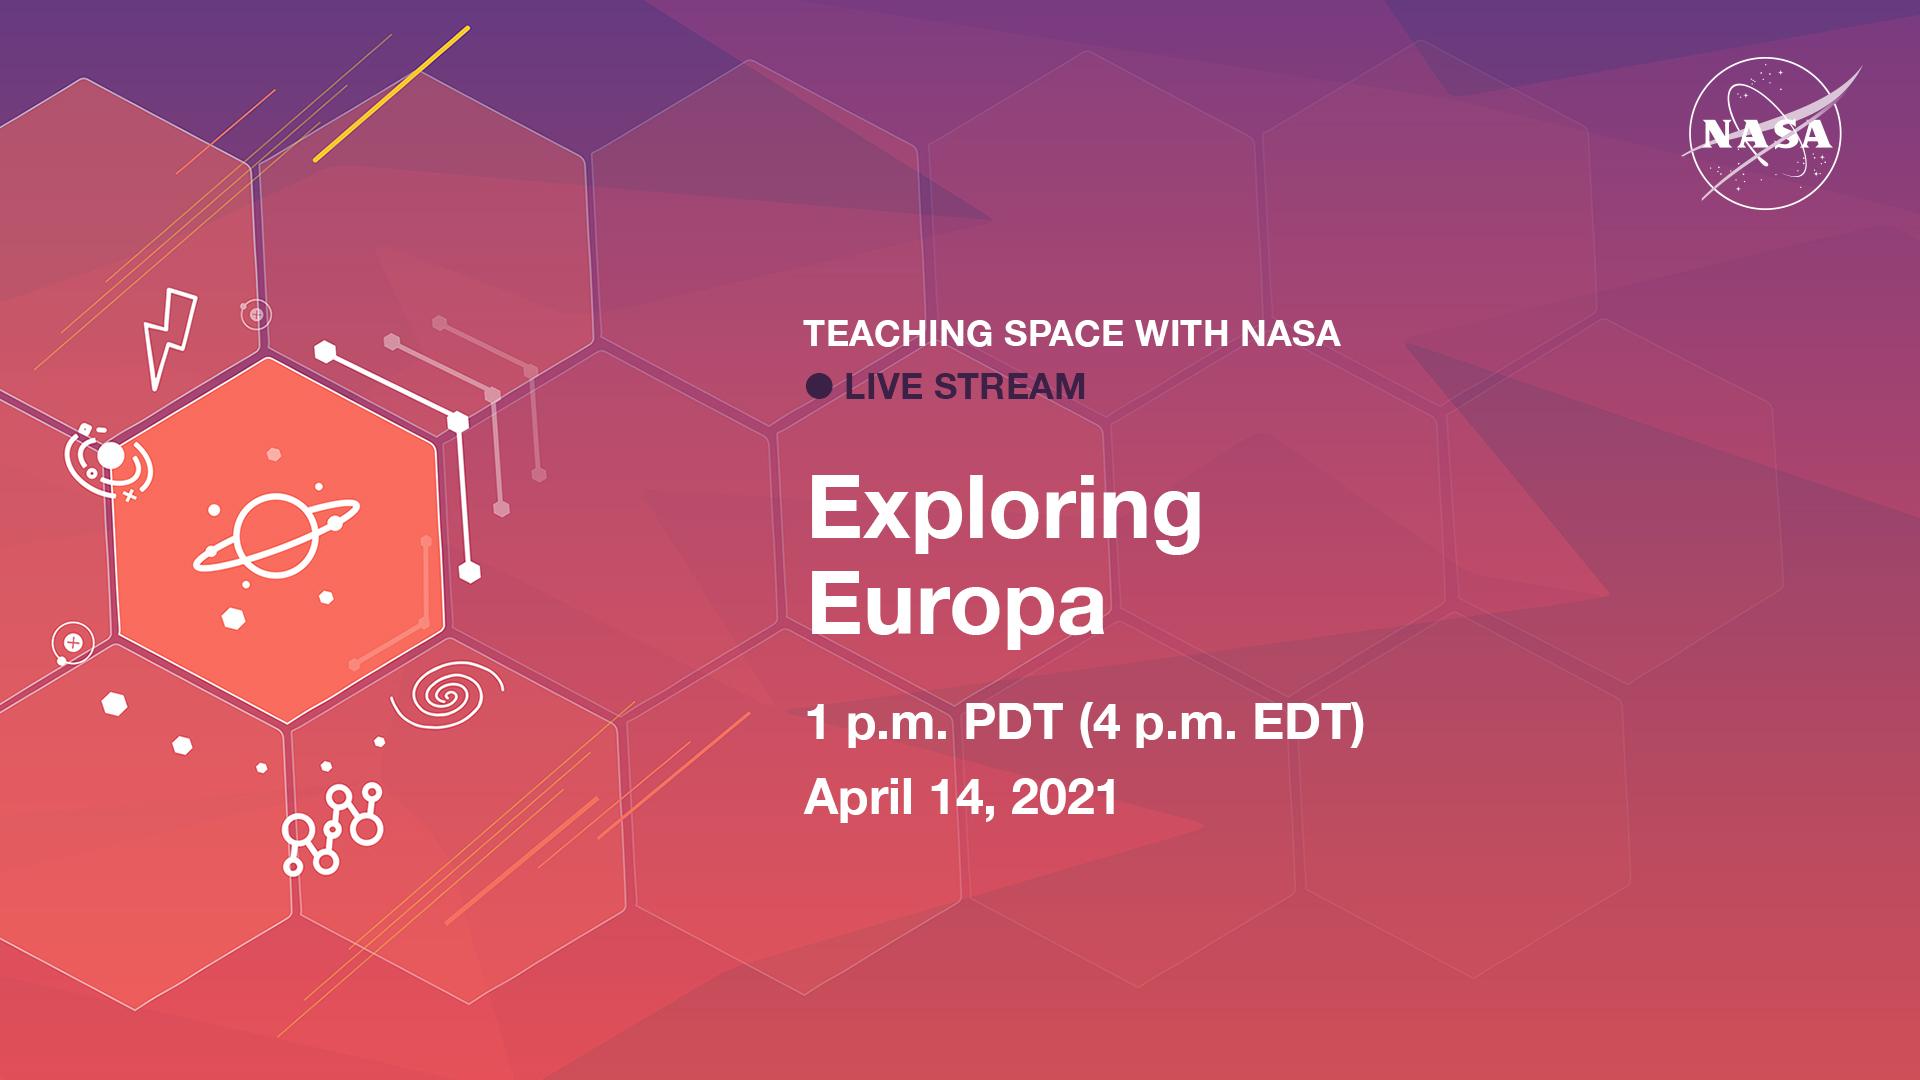 Teaching Space With NASA Live Stream – Exploring Europa